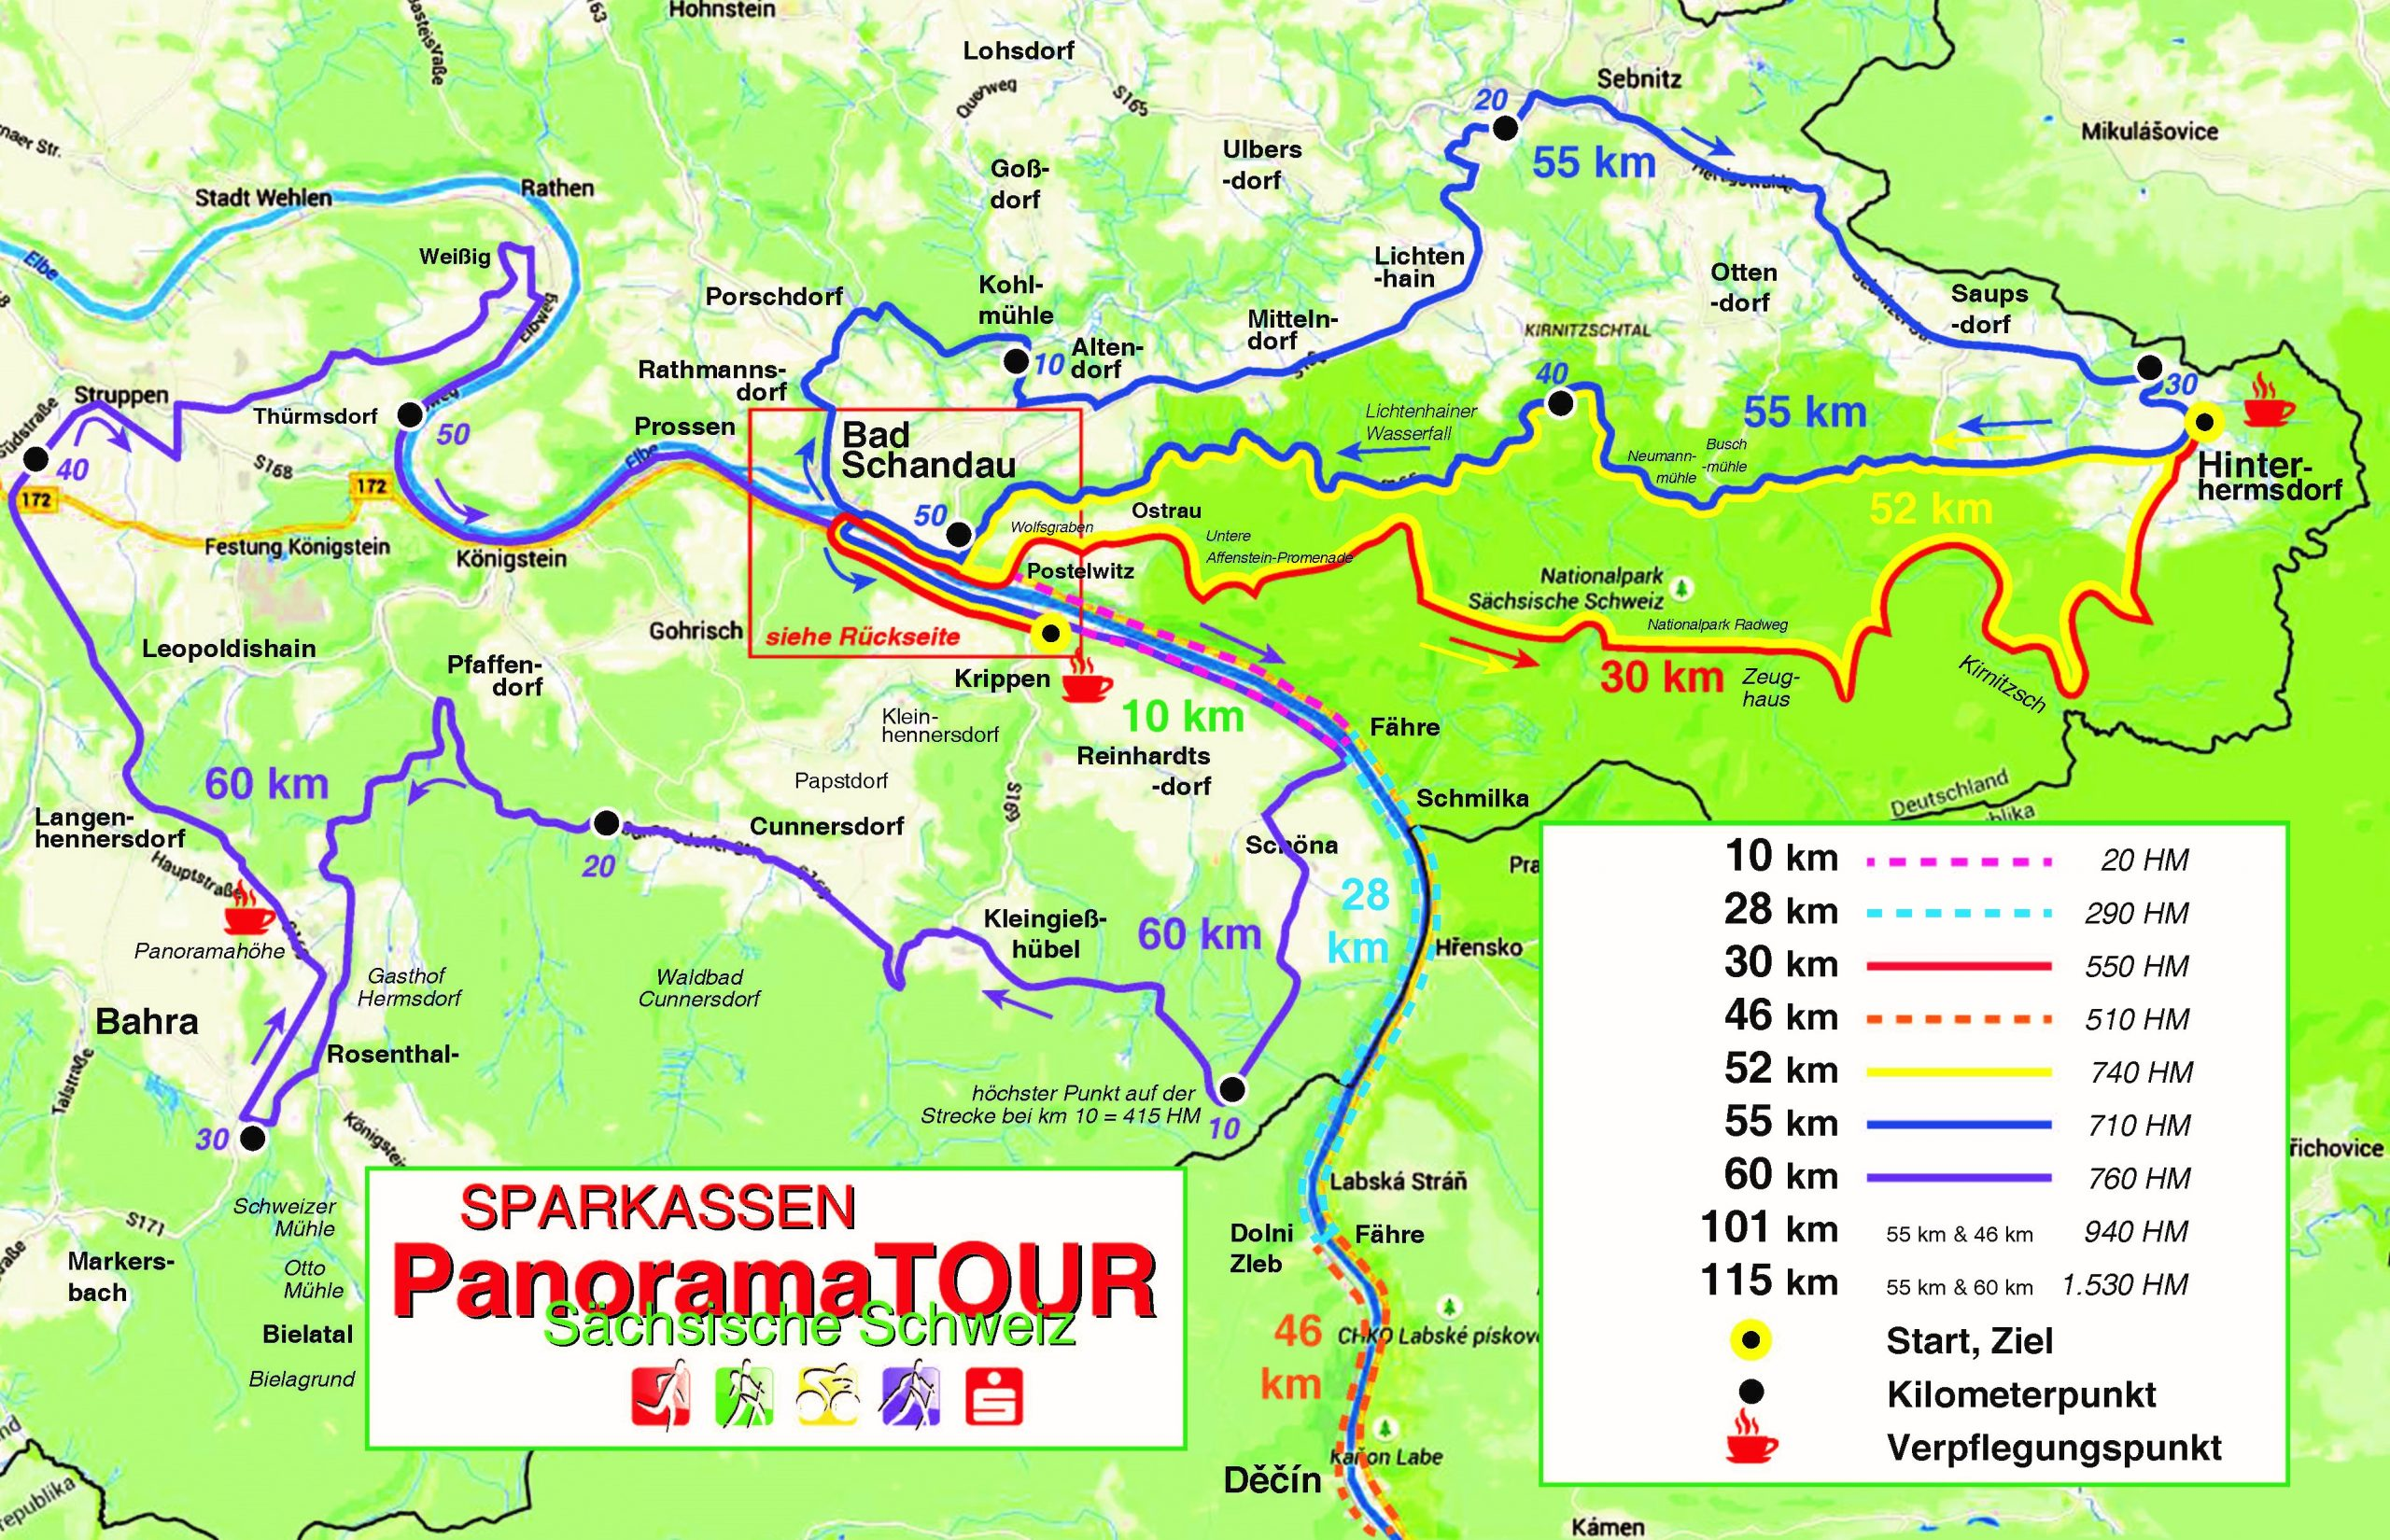 alle Radstrecken Panoramatour